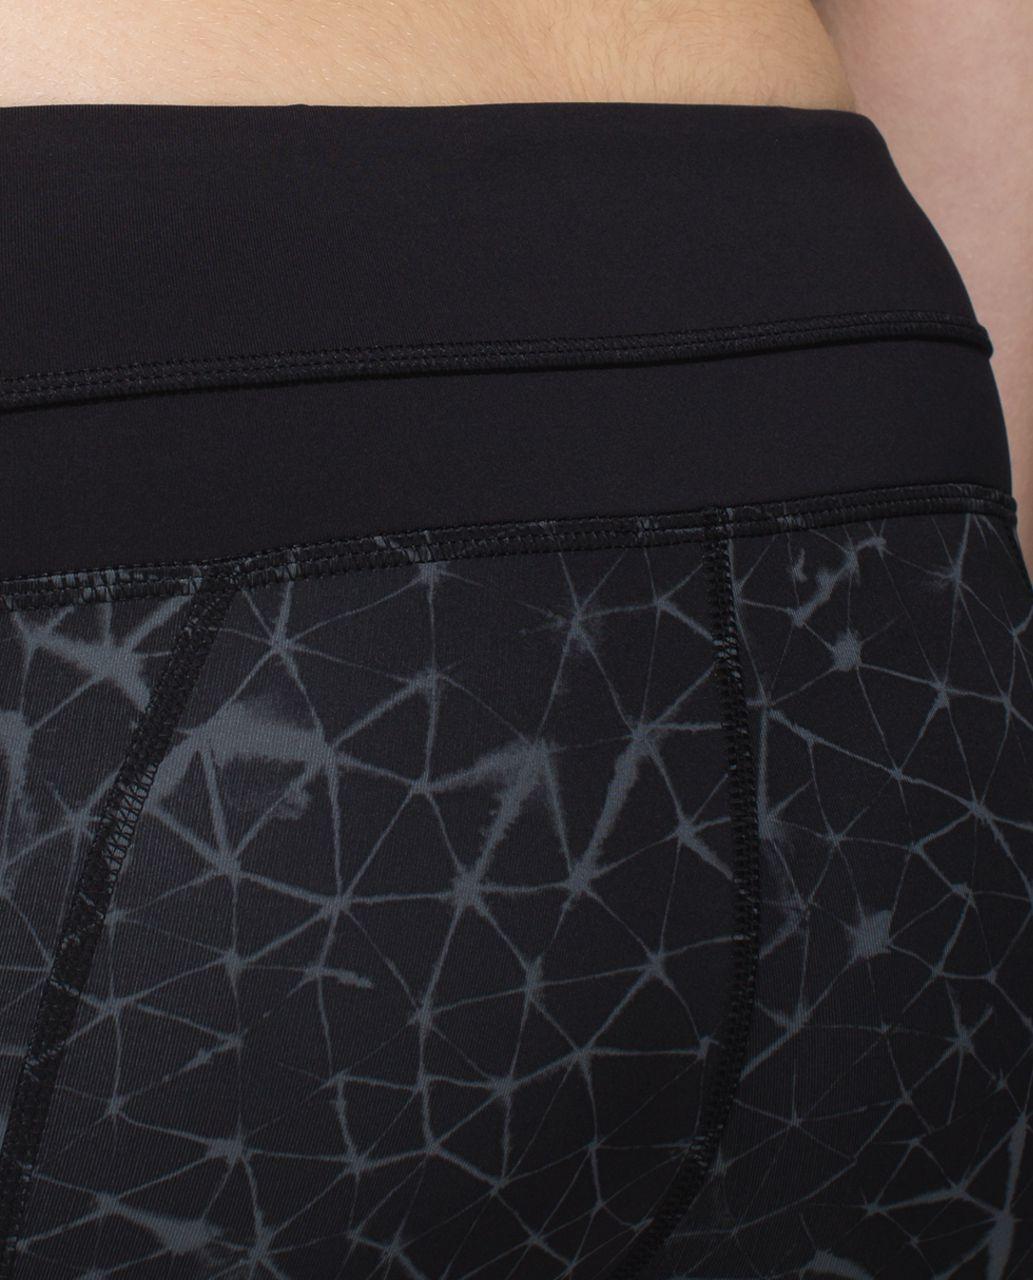 Lululemon Inspire Tight II *Full-On Luxtreme (Mesh) - Star Crushed Coal Black / Black